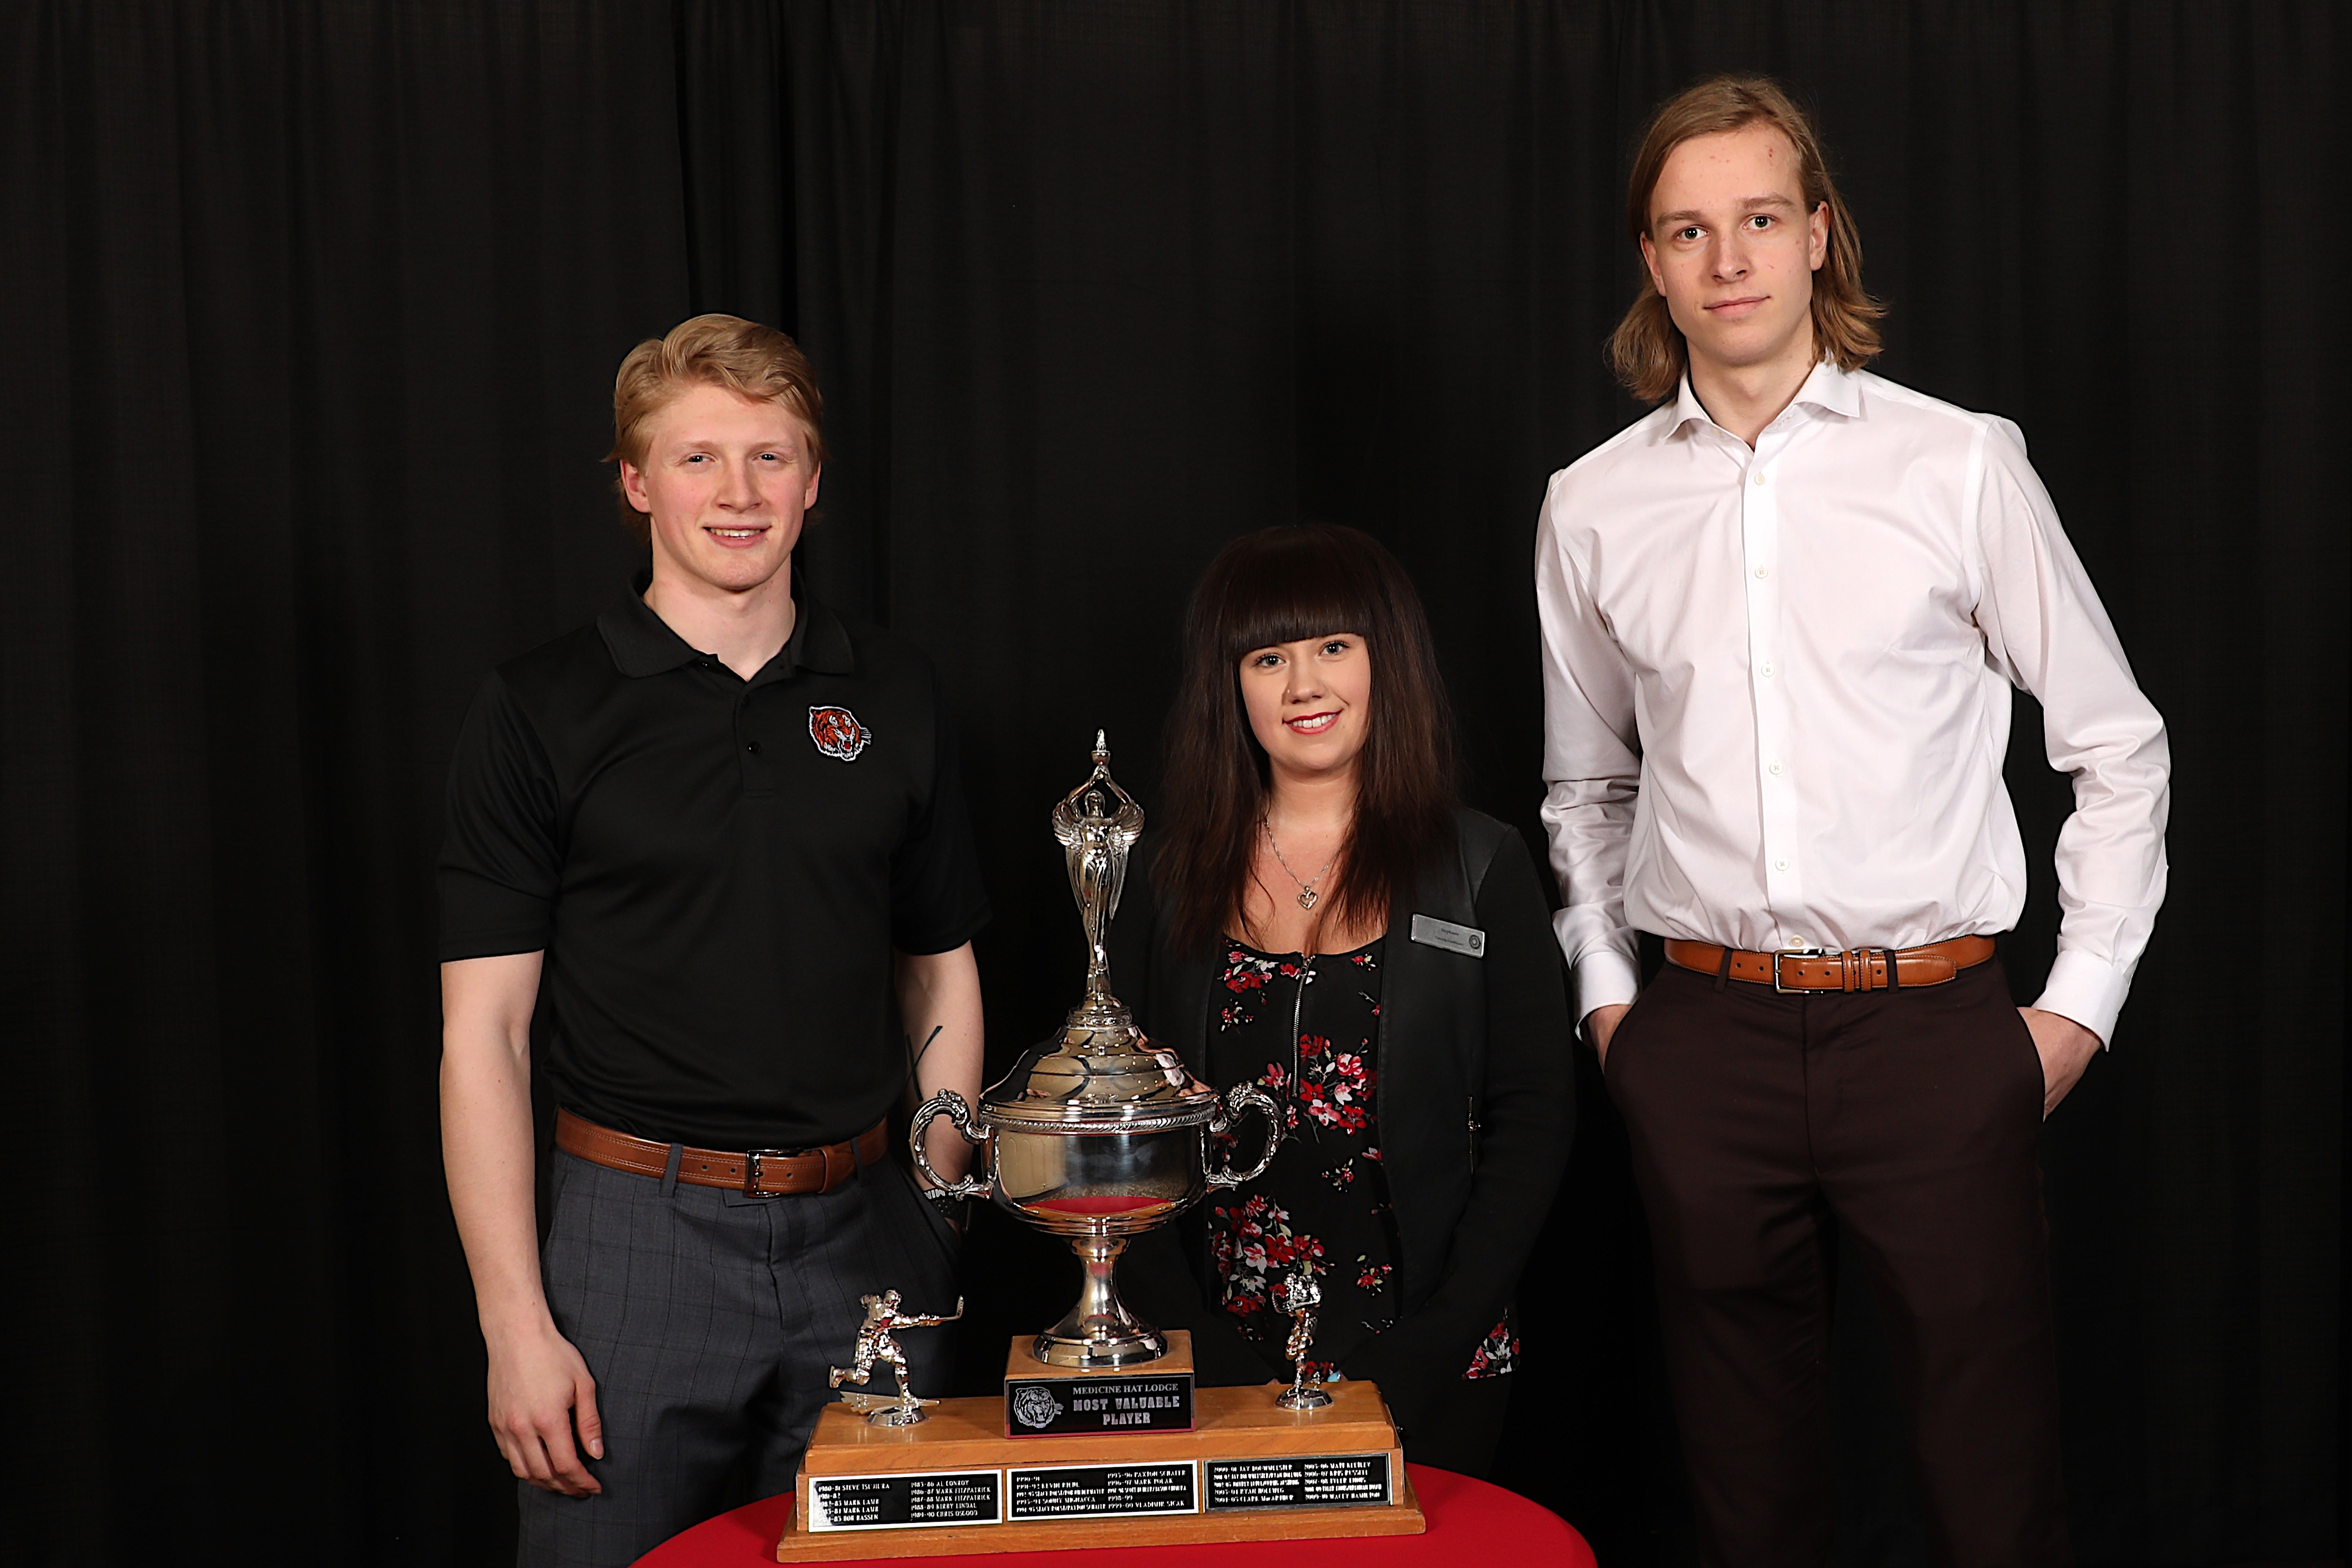 Stephanie Fraser of the Medicine Hat Lodge presented the Medicine Hat Lodge Most Valuable Player to Mads Søgaard & James Hamblin